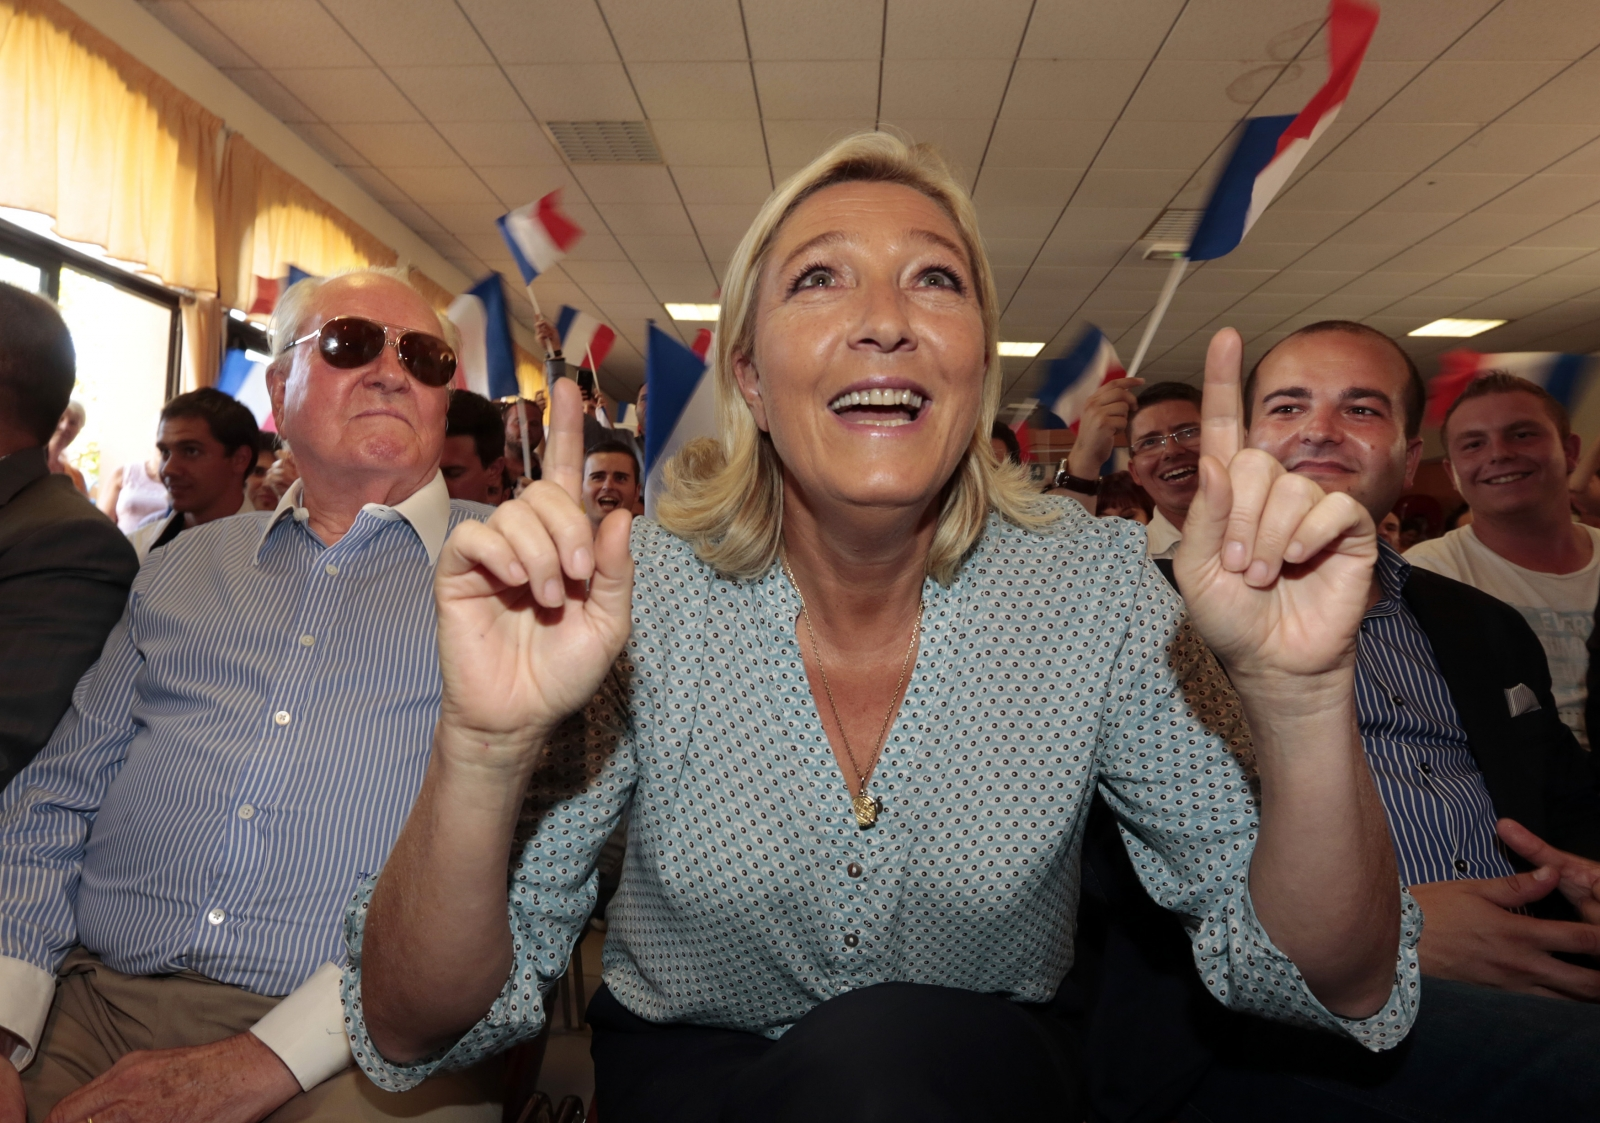 Marine Le Pen, France's National Front political party leader (C)